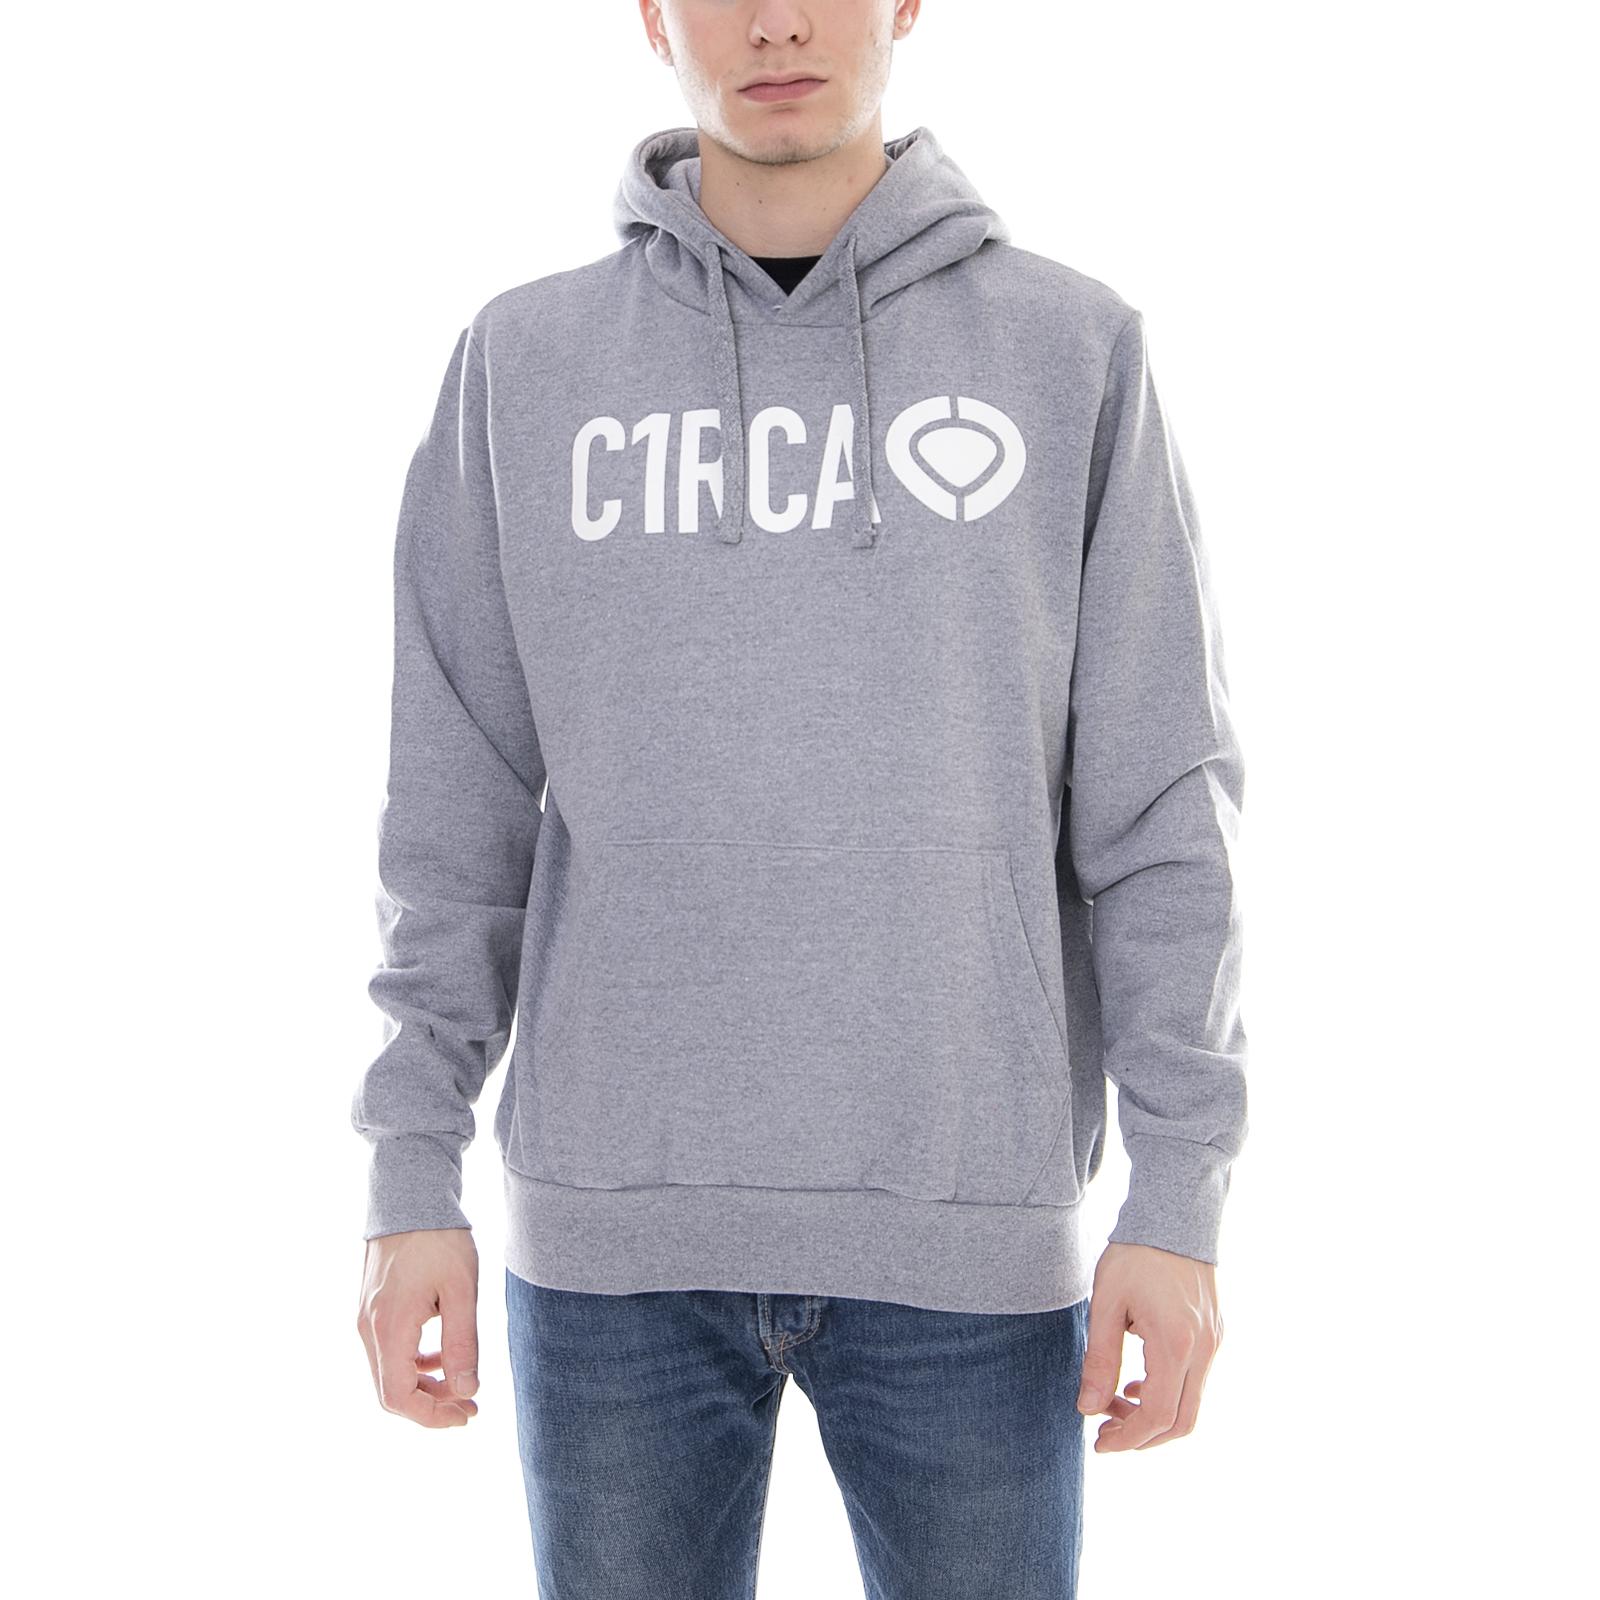 Us under armour af icon fz loose fit hoodie blue grey S M L XL 2XL 3XL RRP £65